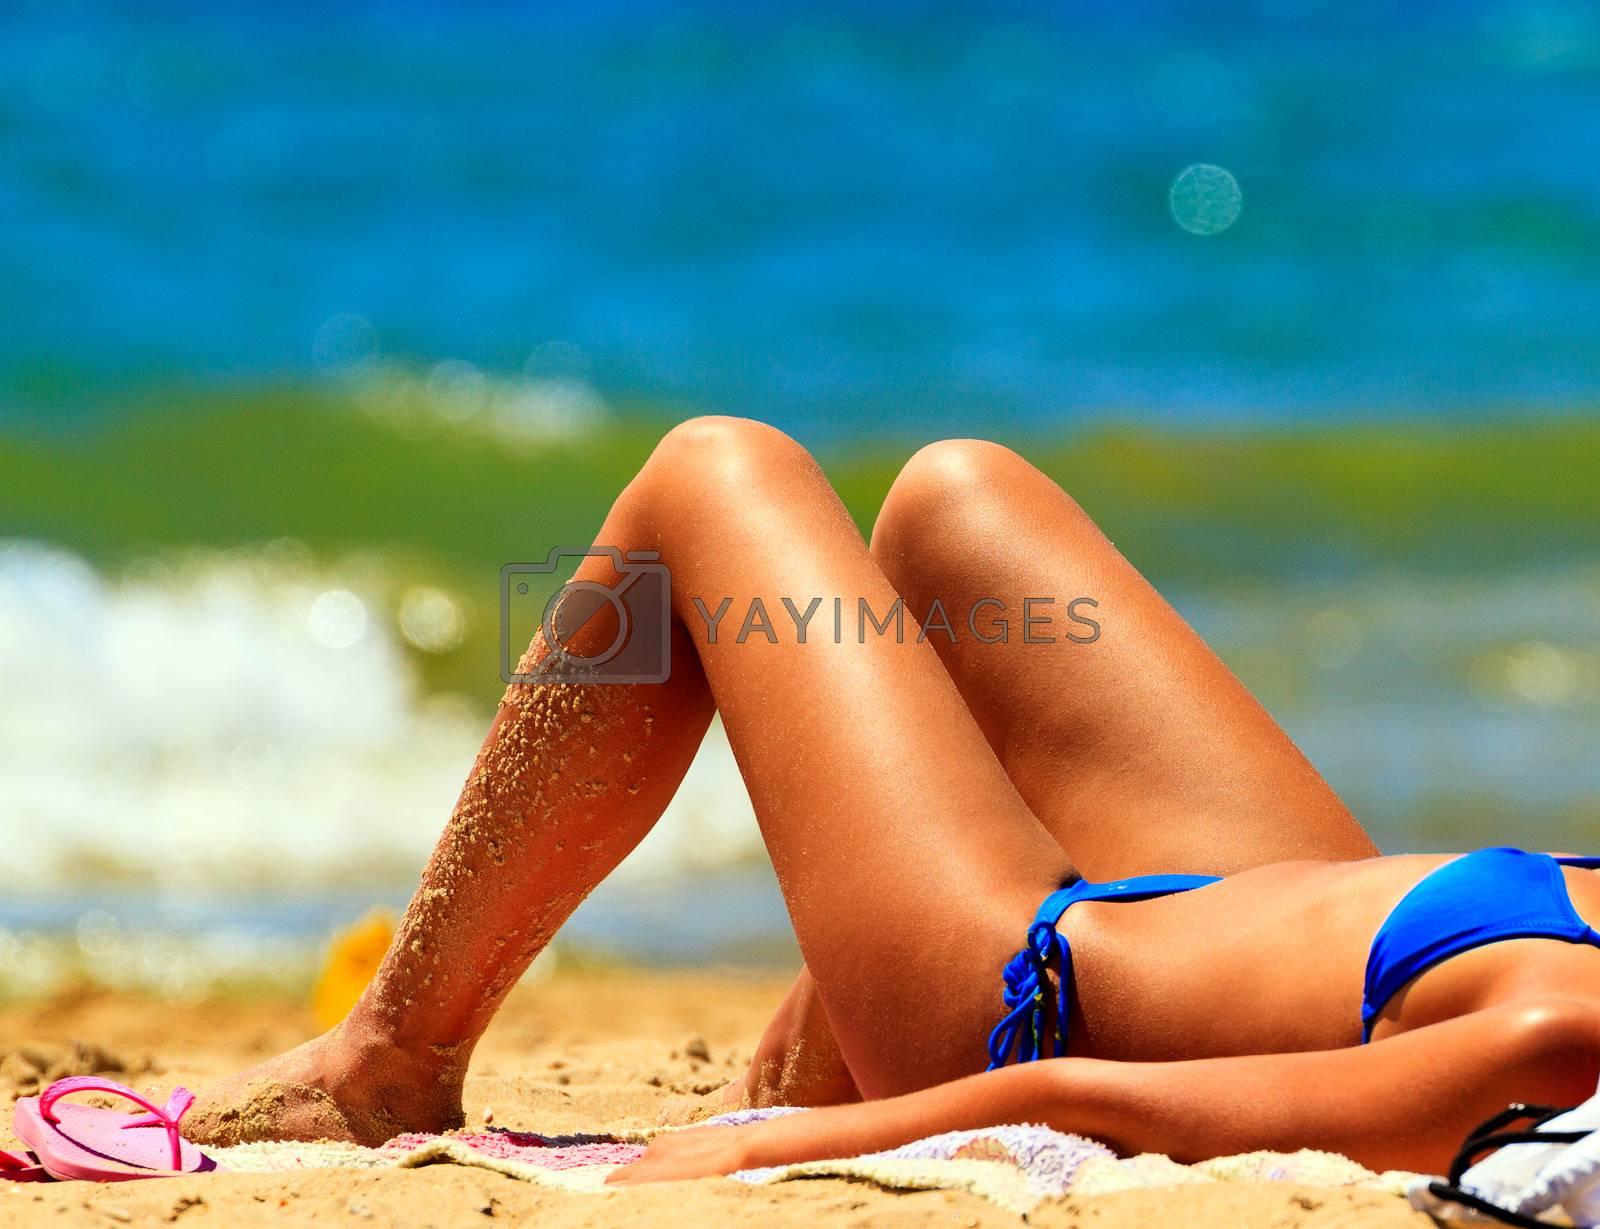 Woman sunbathing on a sandy beach